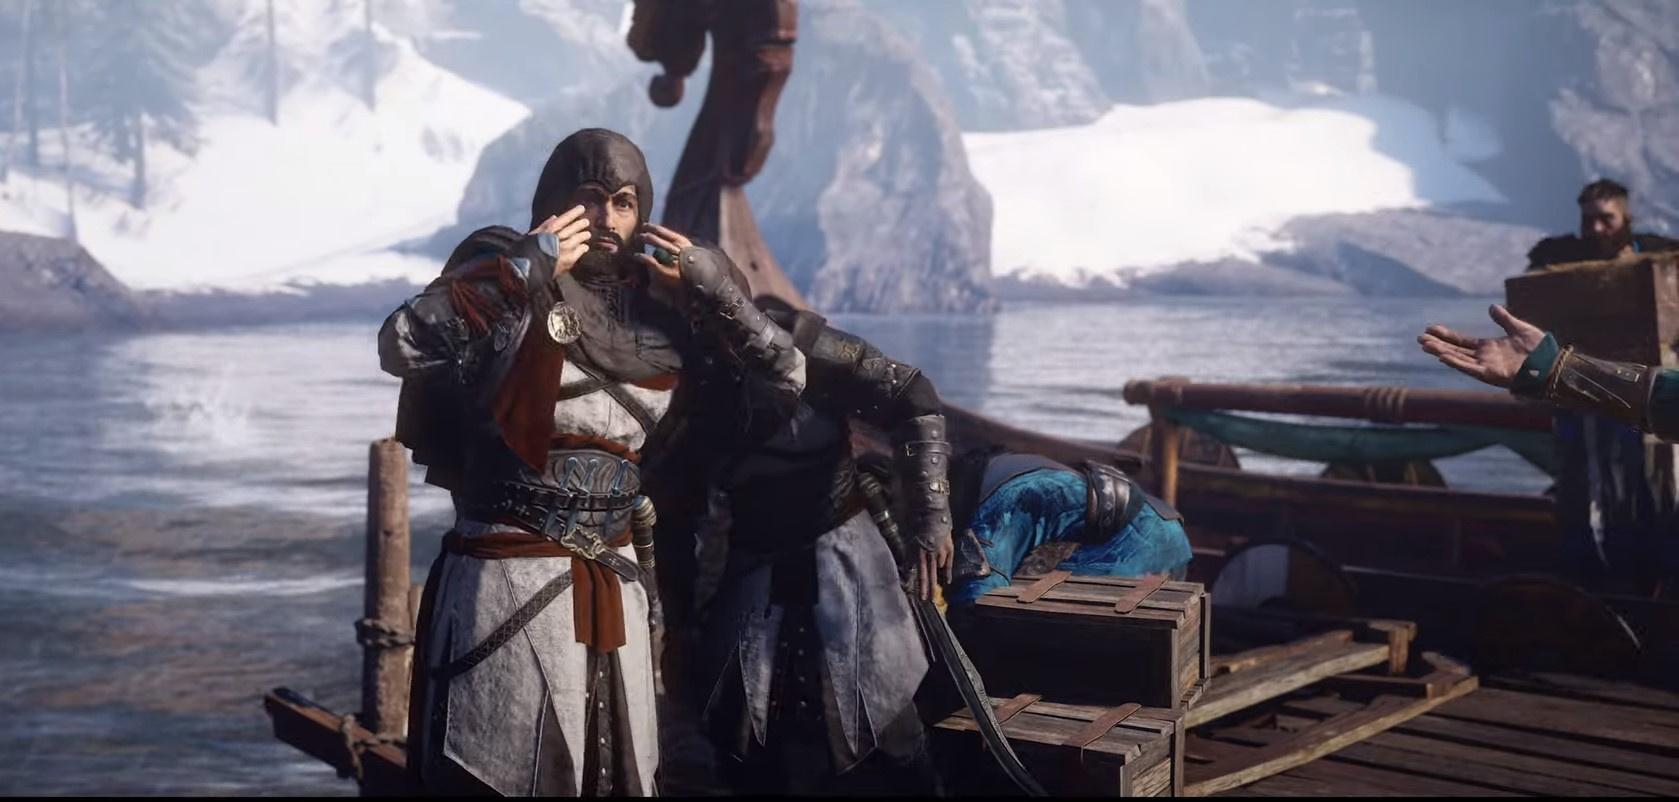 В сюжетном трейлере Assassin's Creed Valhalla показали ассассина Басима